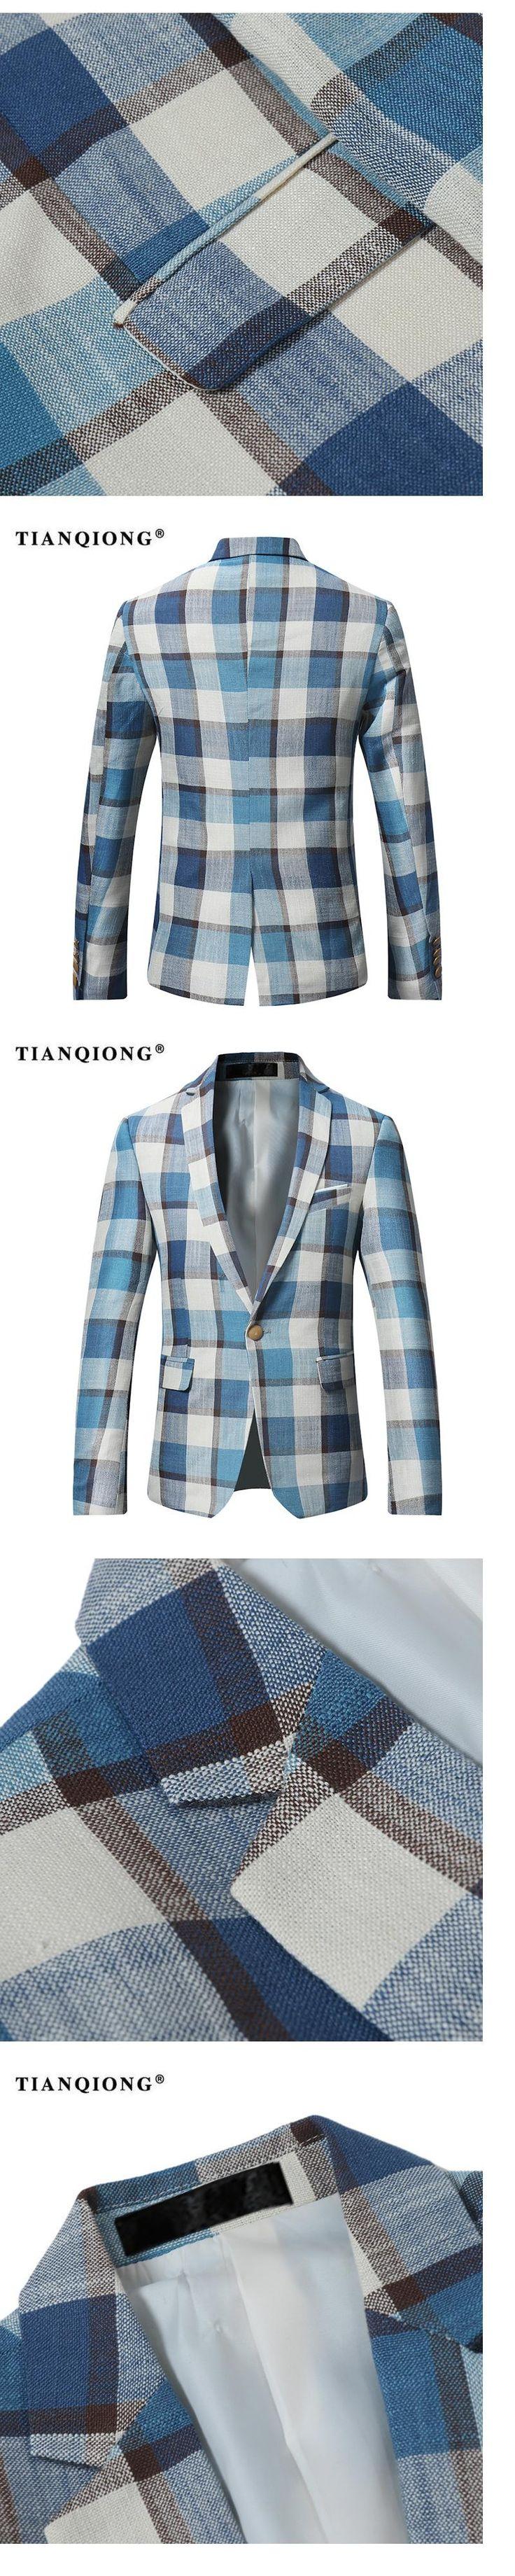 TIAN QIONG 2017 New Men's Casual Blazer Slim Fit Fashion Plaid Blazer Men Top Quality Black Blazers Size S-4XL Blazer Masculino